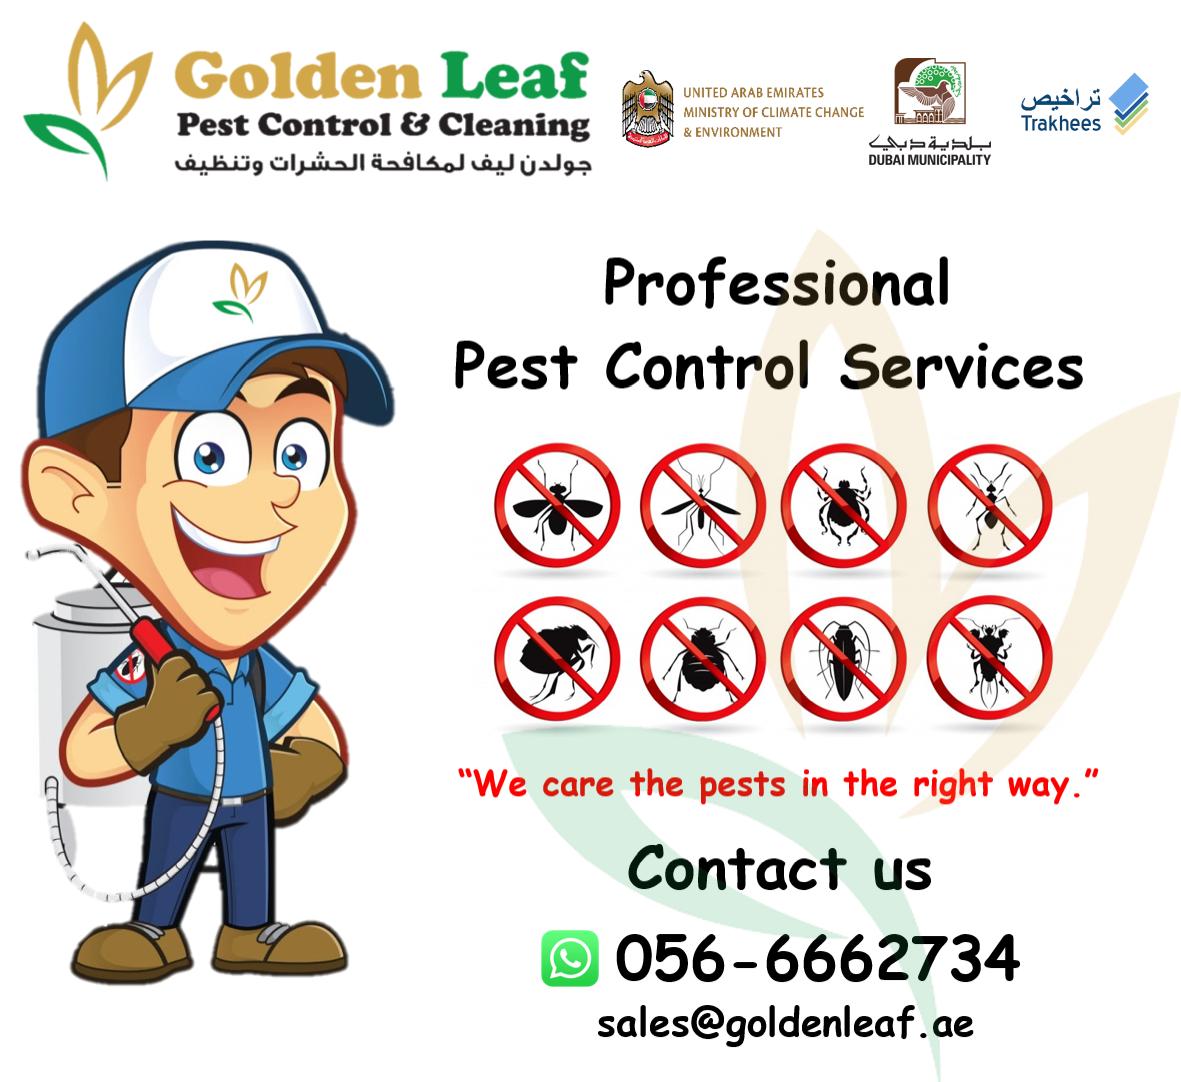 Pest control_services.png